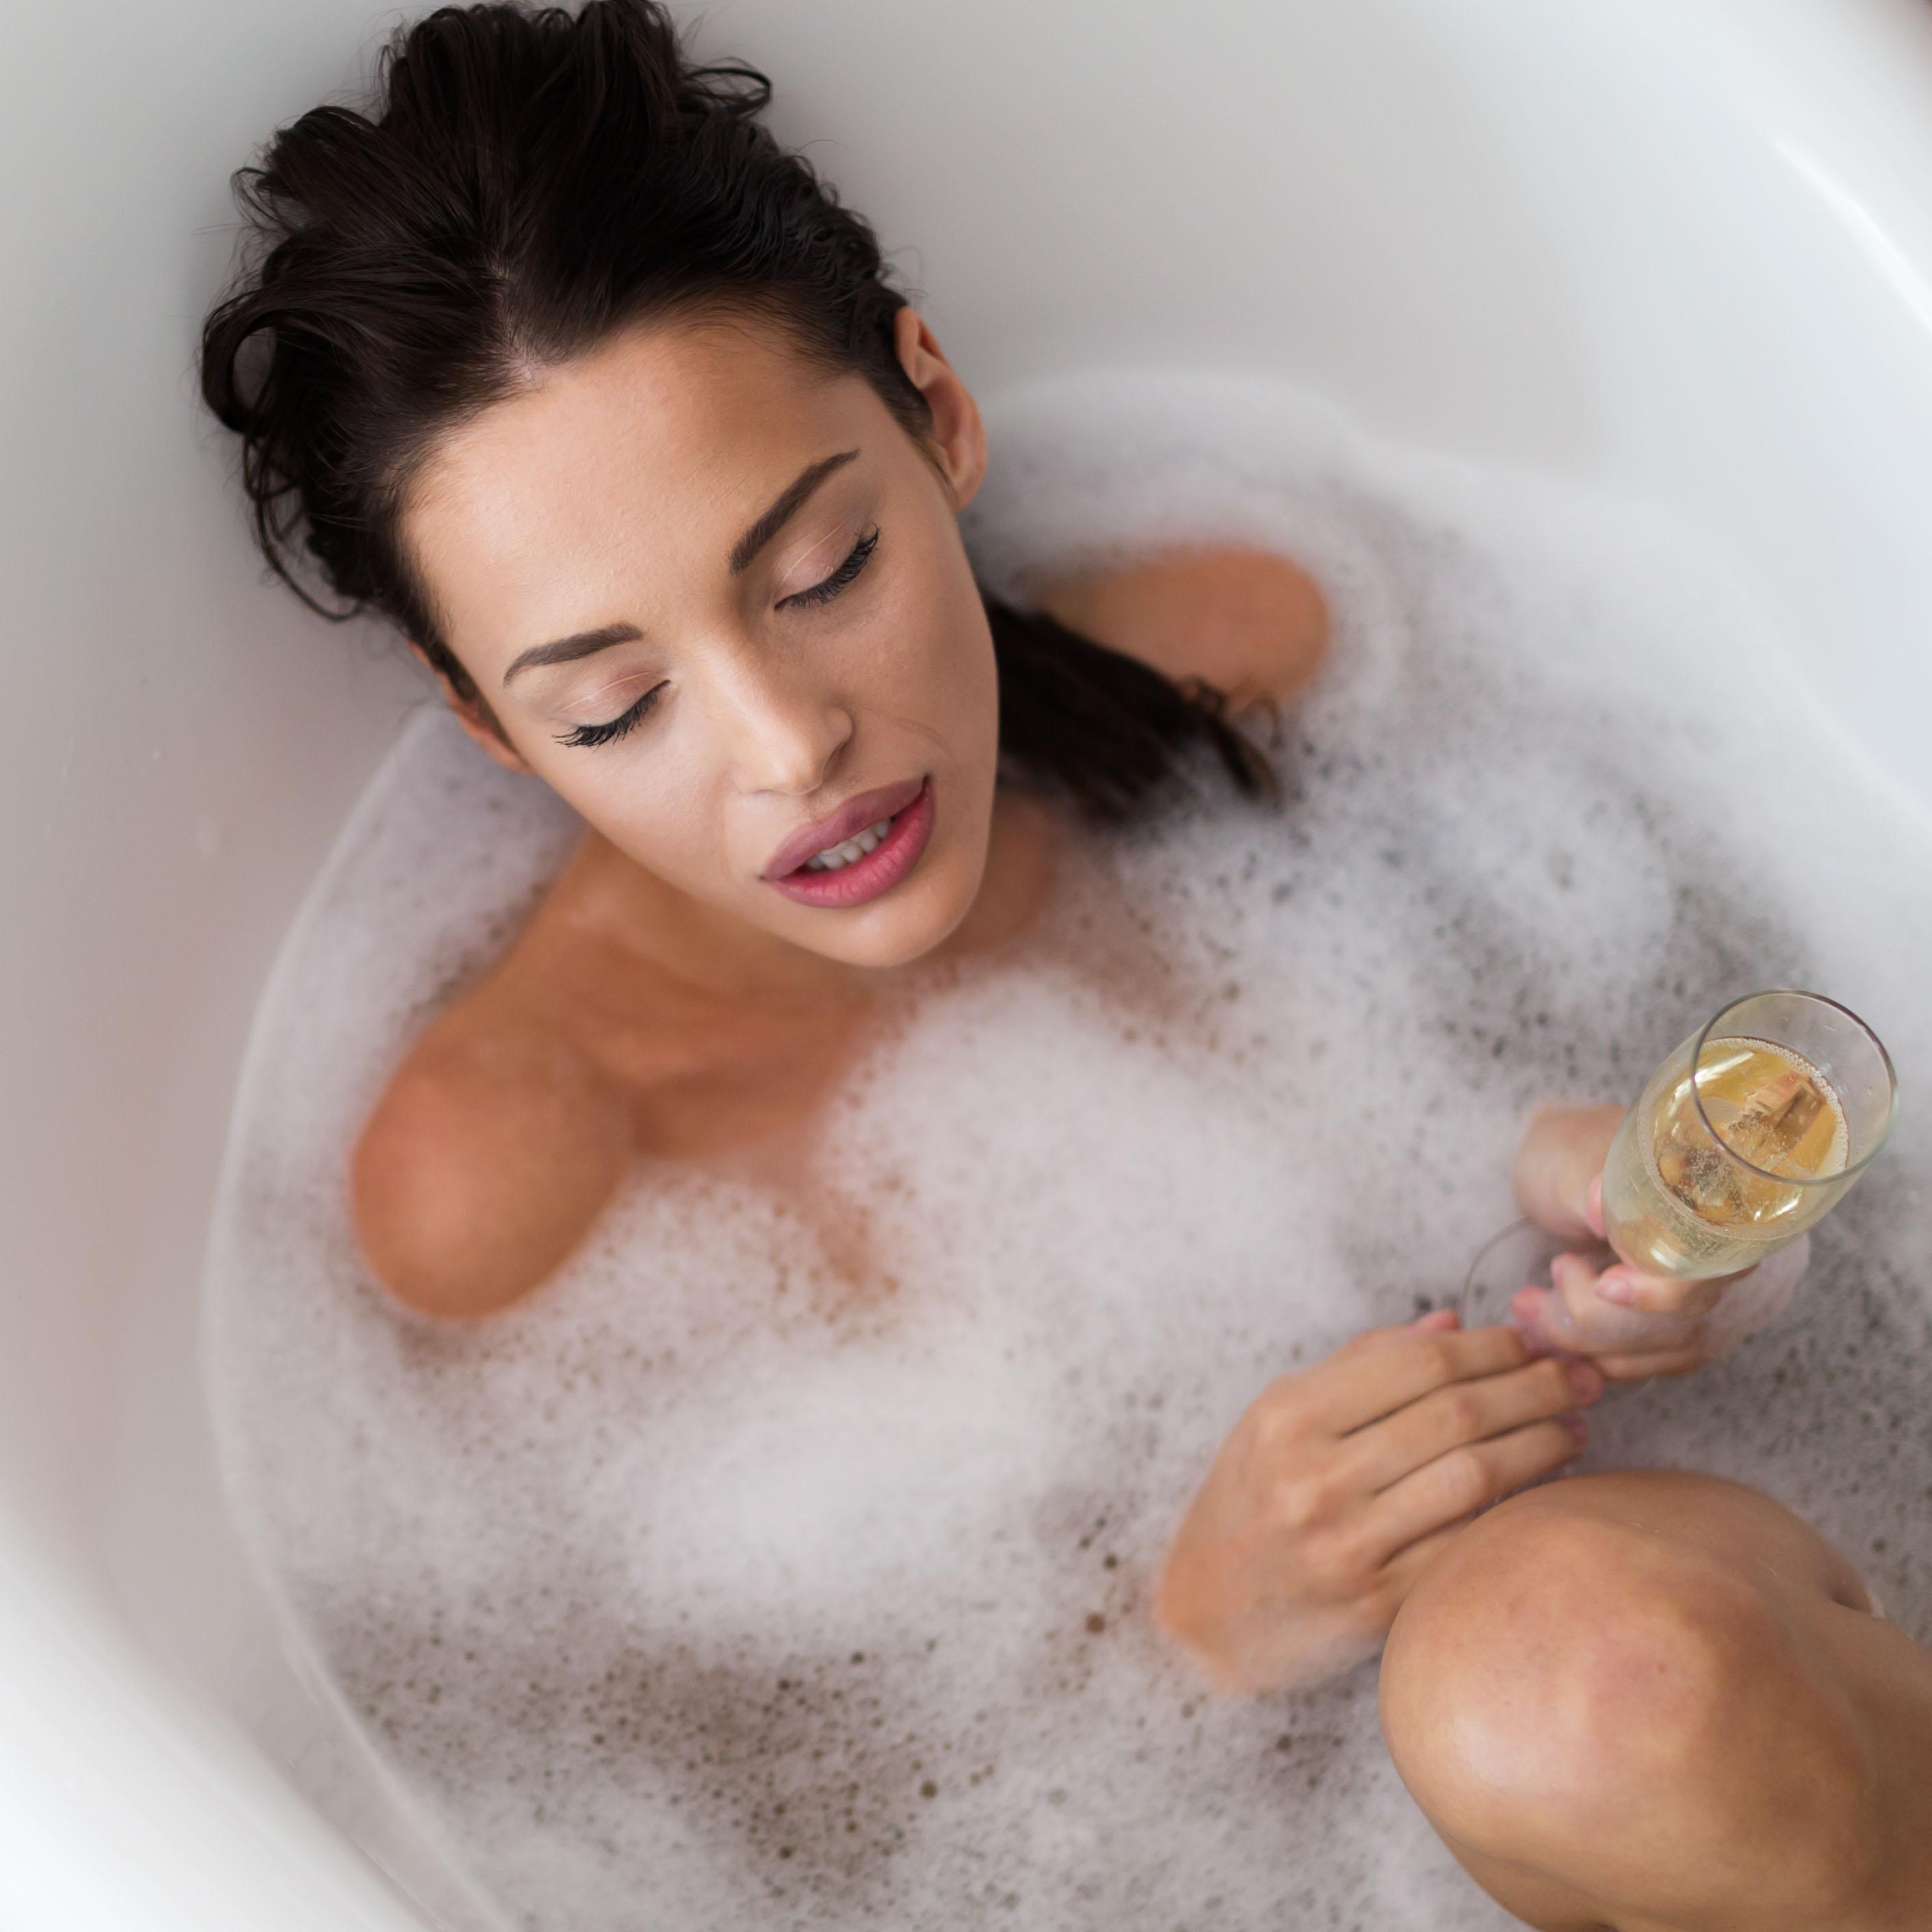 Beautiful woman having a bubble bath